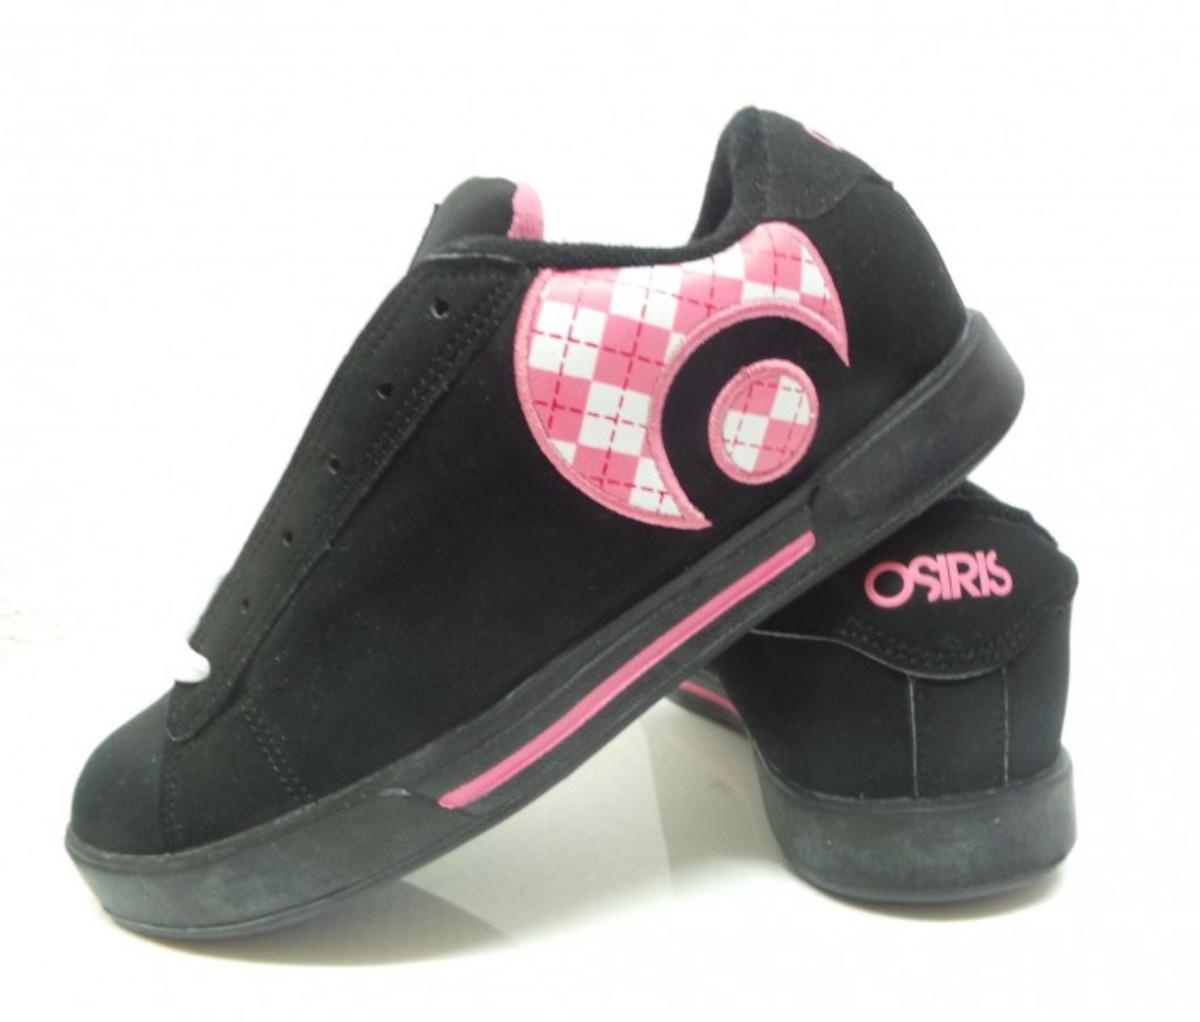 Osiris Skateboard Schuhe Serve Icon Girls schwarz Bubble Gum  Argyle  schwarz Bubble Gum  Argyle